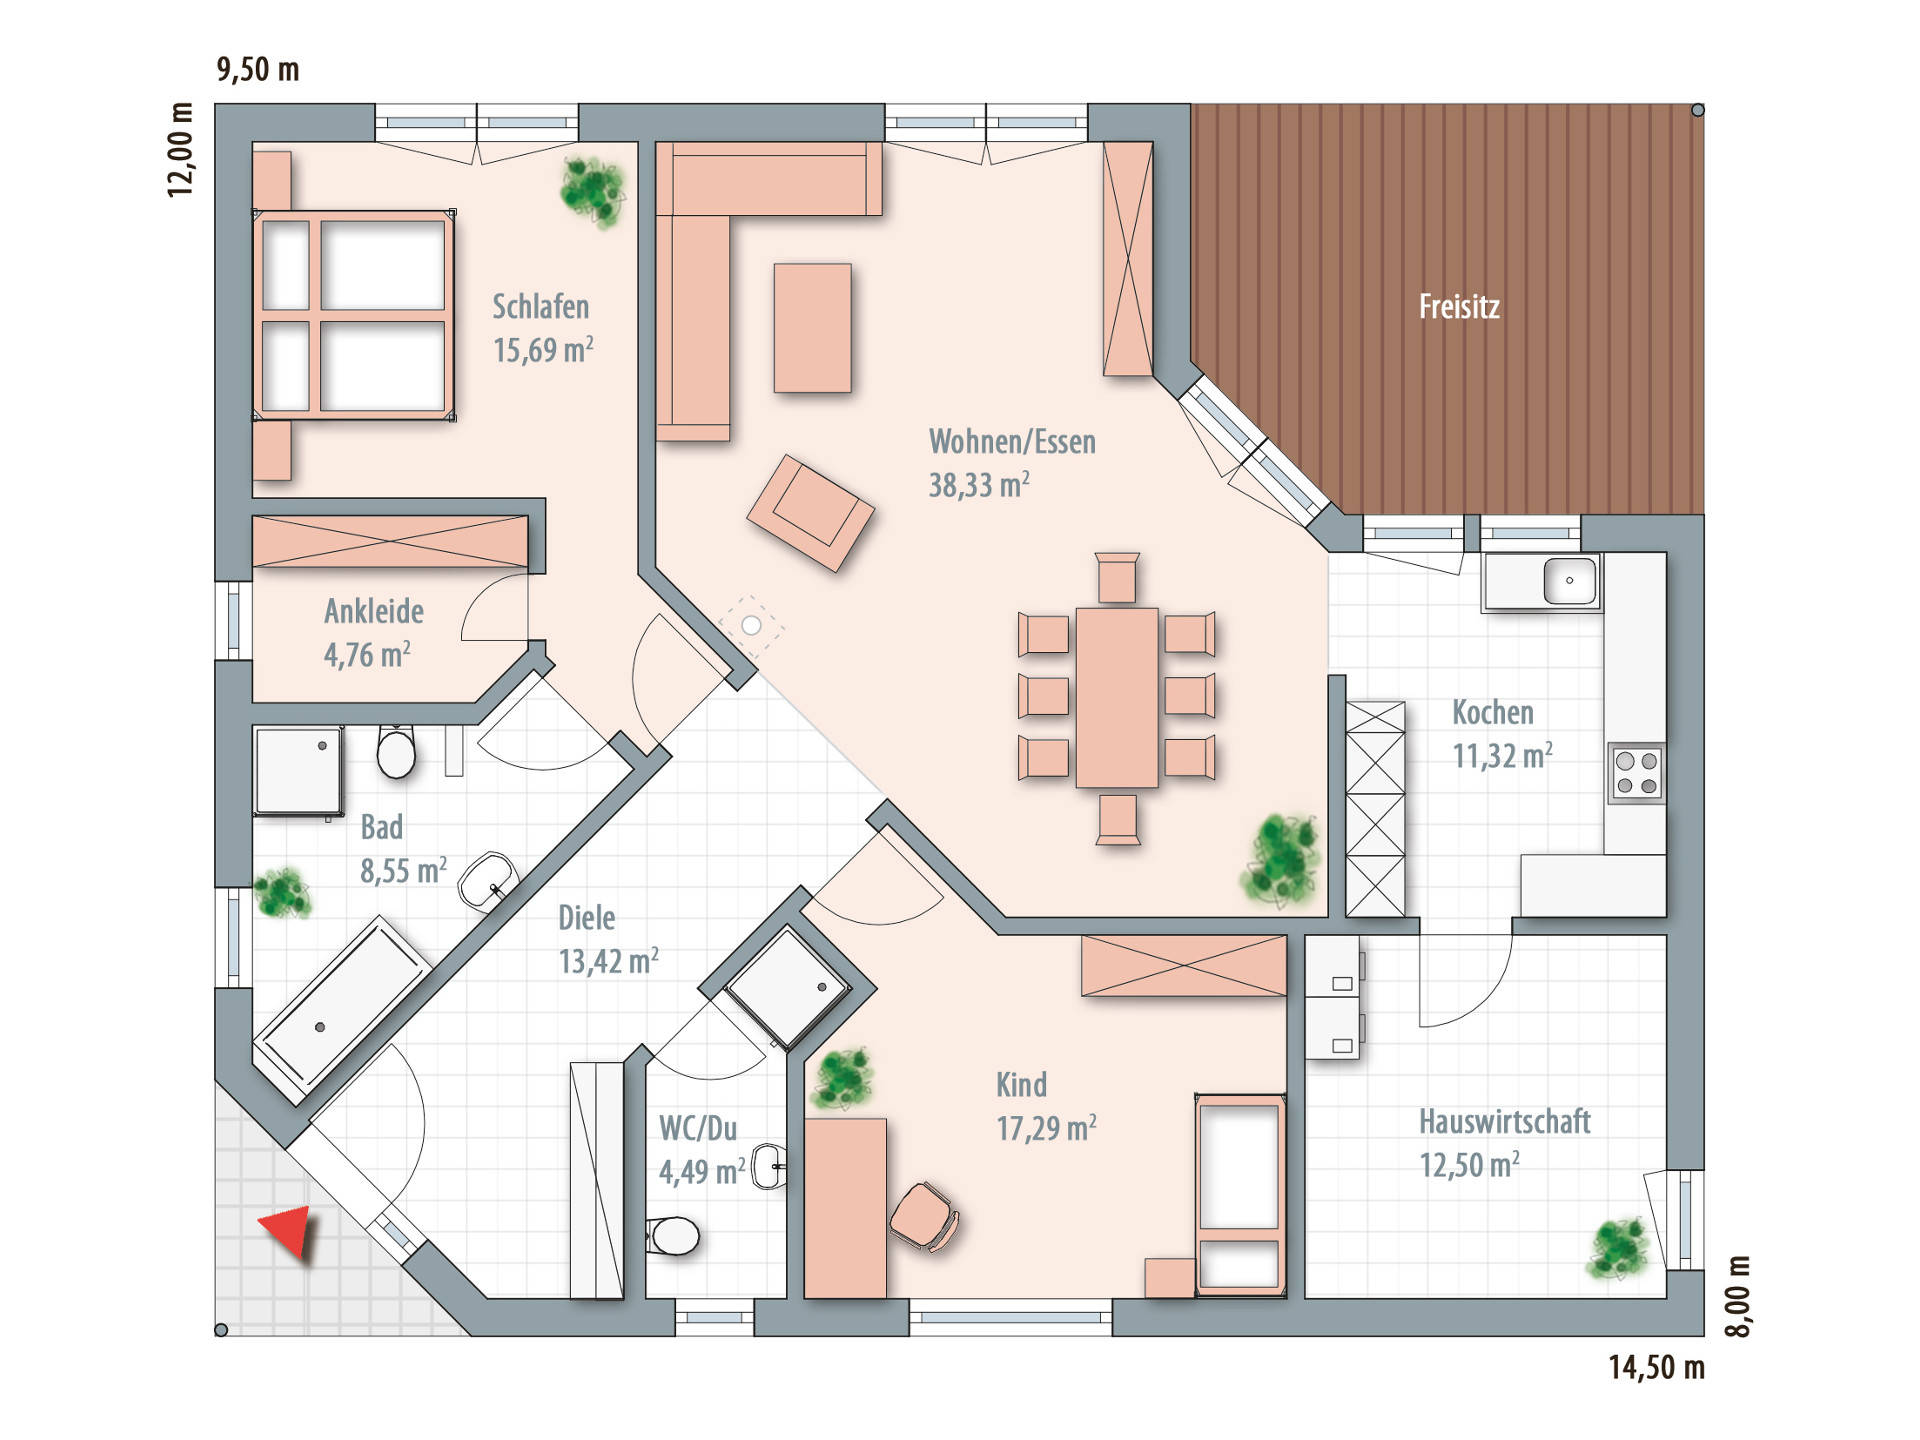 Musterhaus grundriss bungalow  Bungalow 130 - Zimmermann Haus